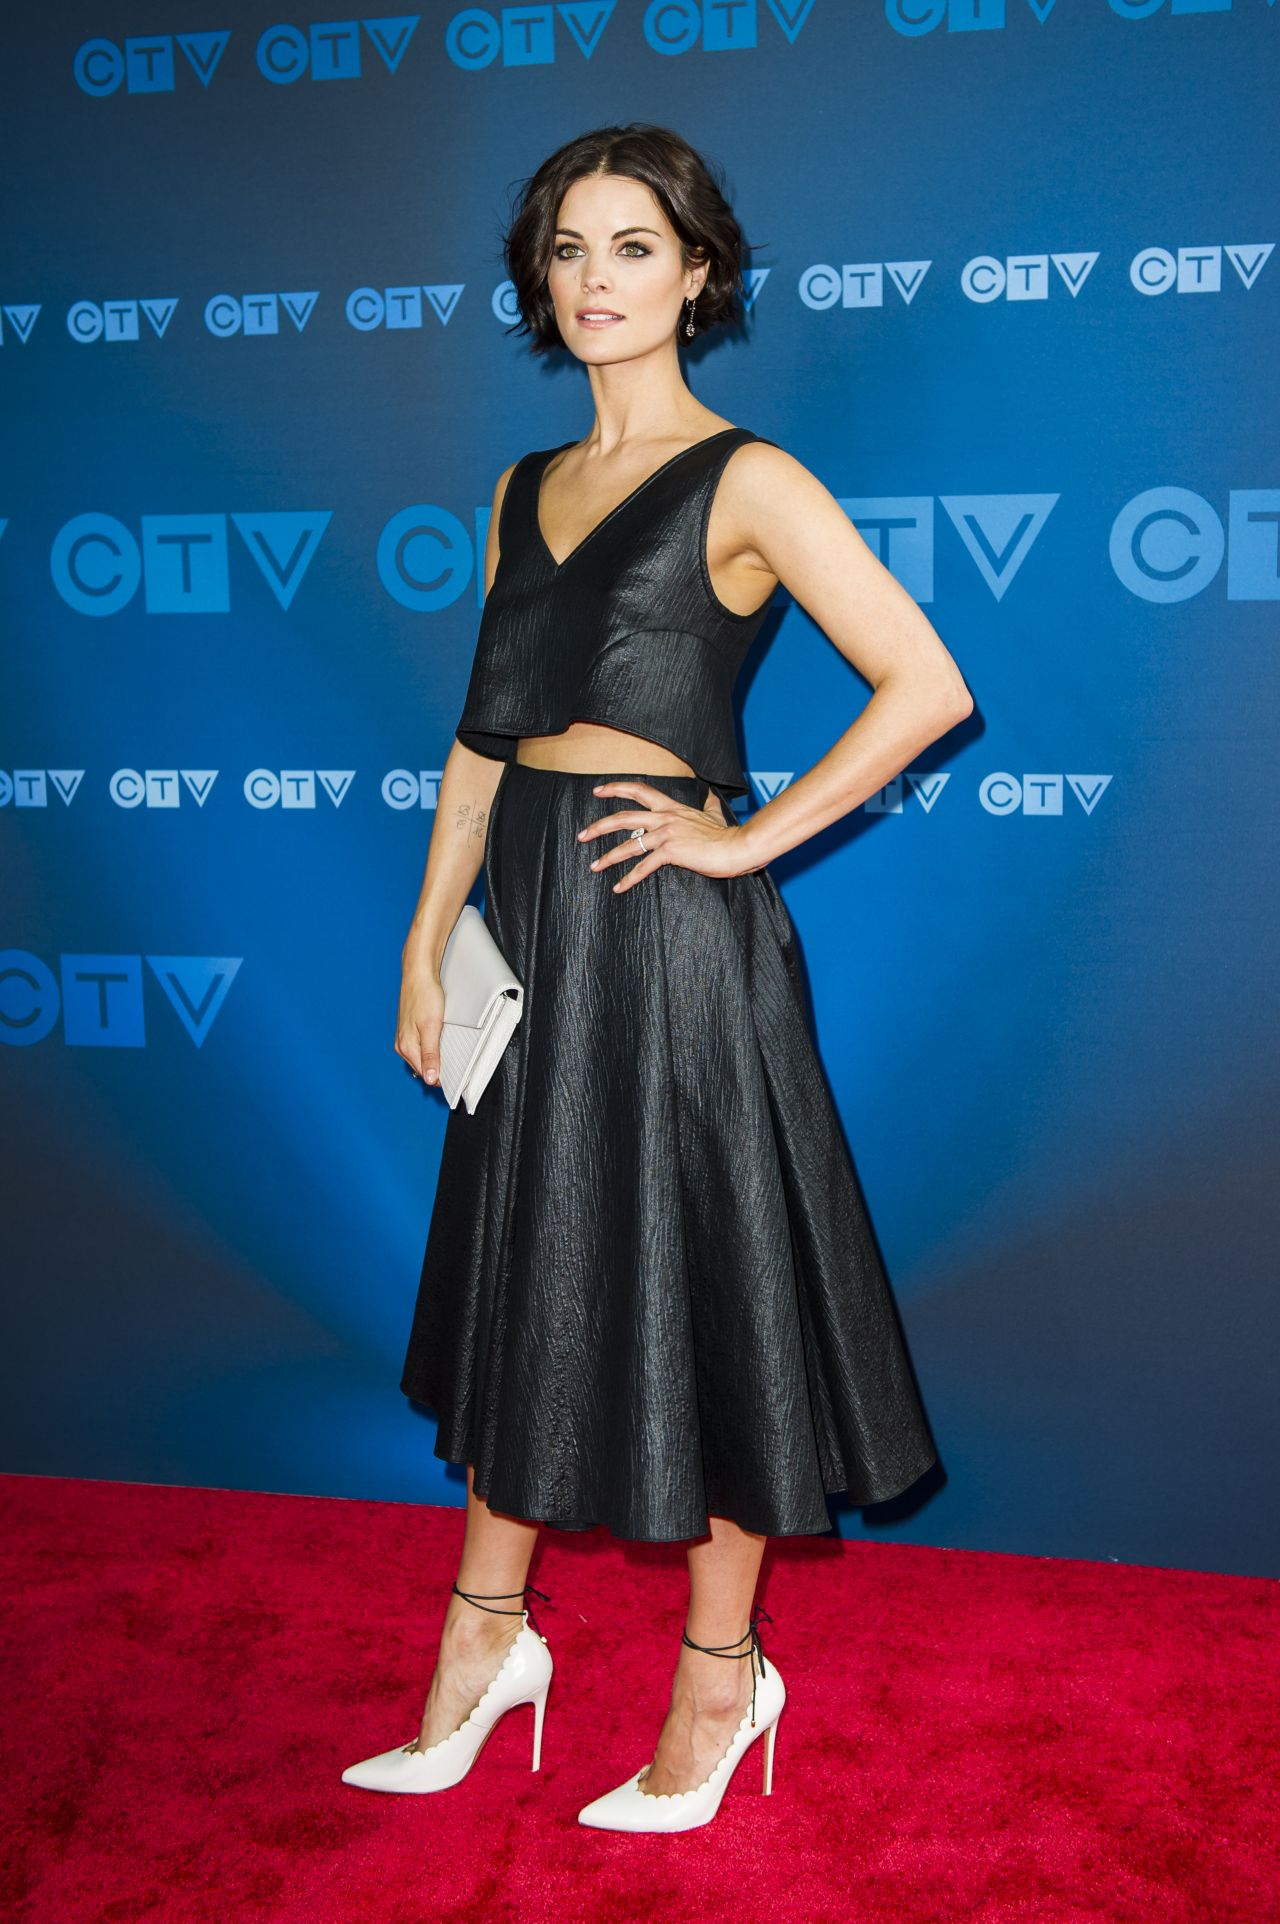 Jaimie Alexander 2015 Ctv Upfronts In Toront